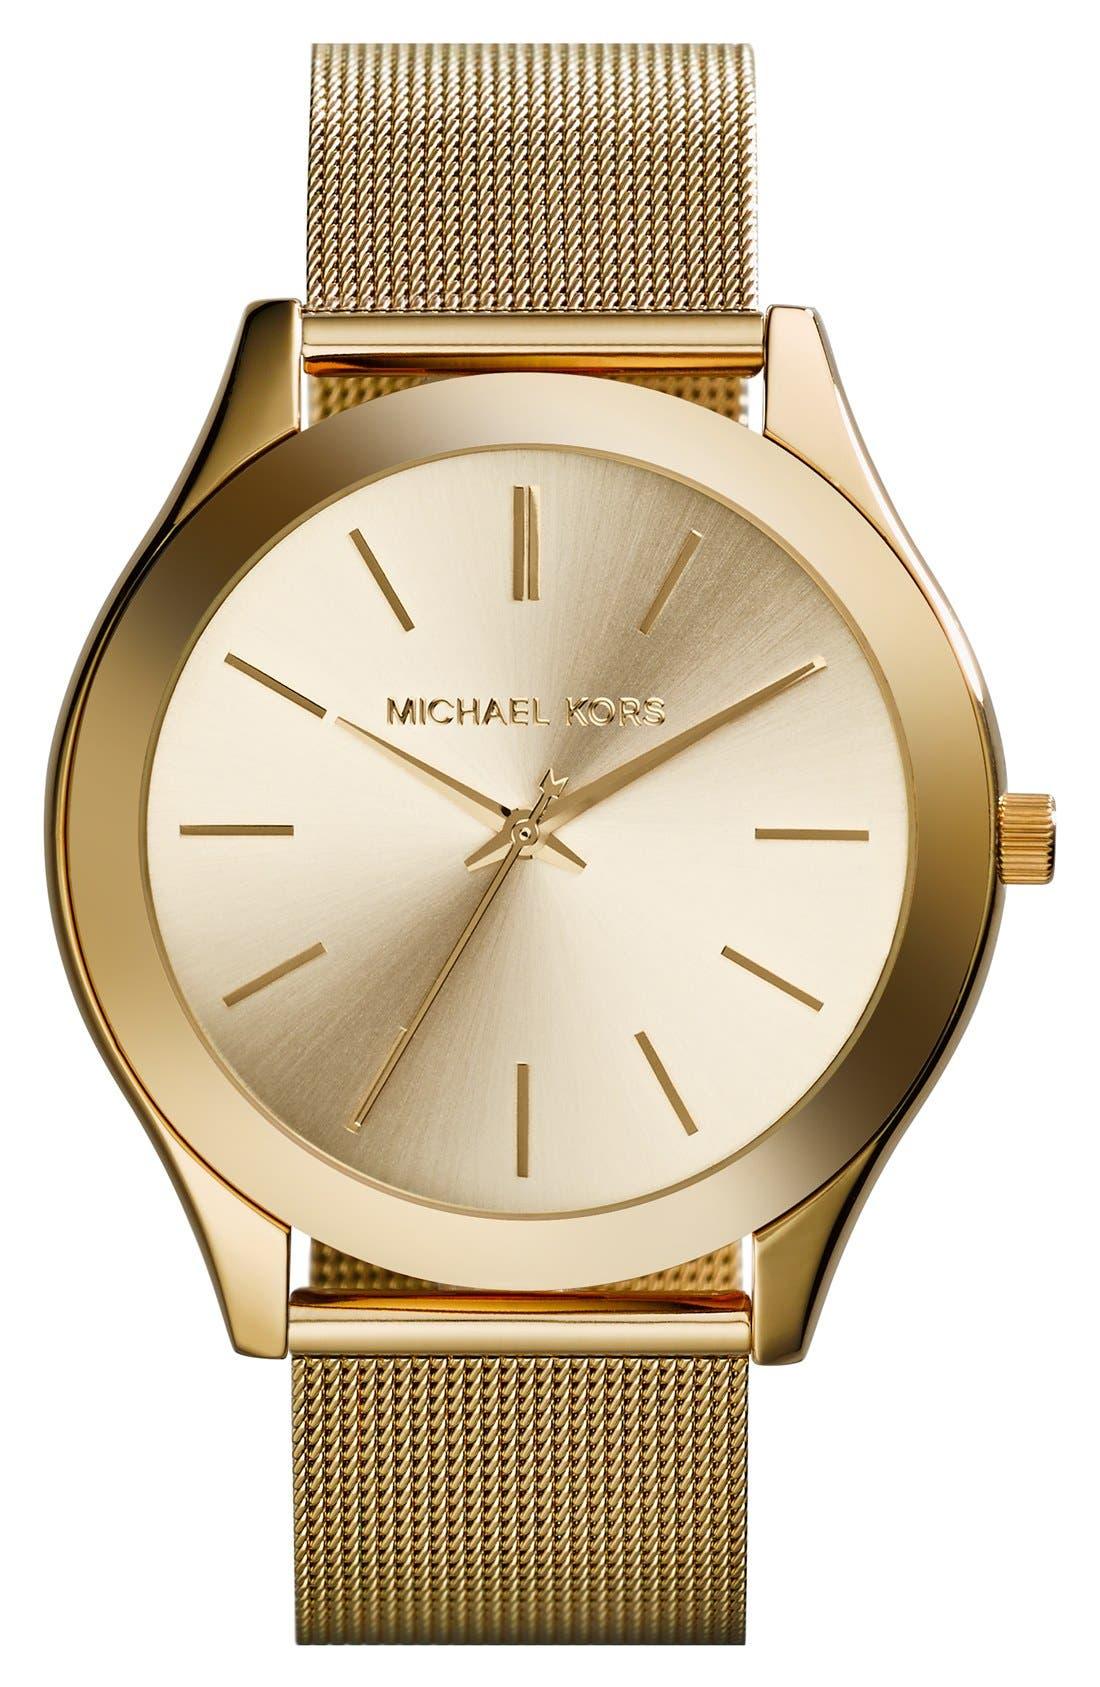 Main Image - Michael Kors 'Slim Runway' Mesh Strap Watch, 42mm